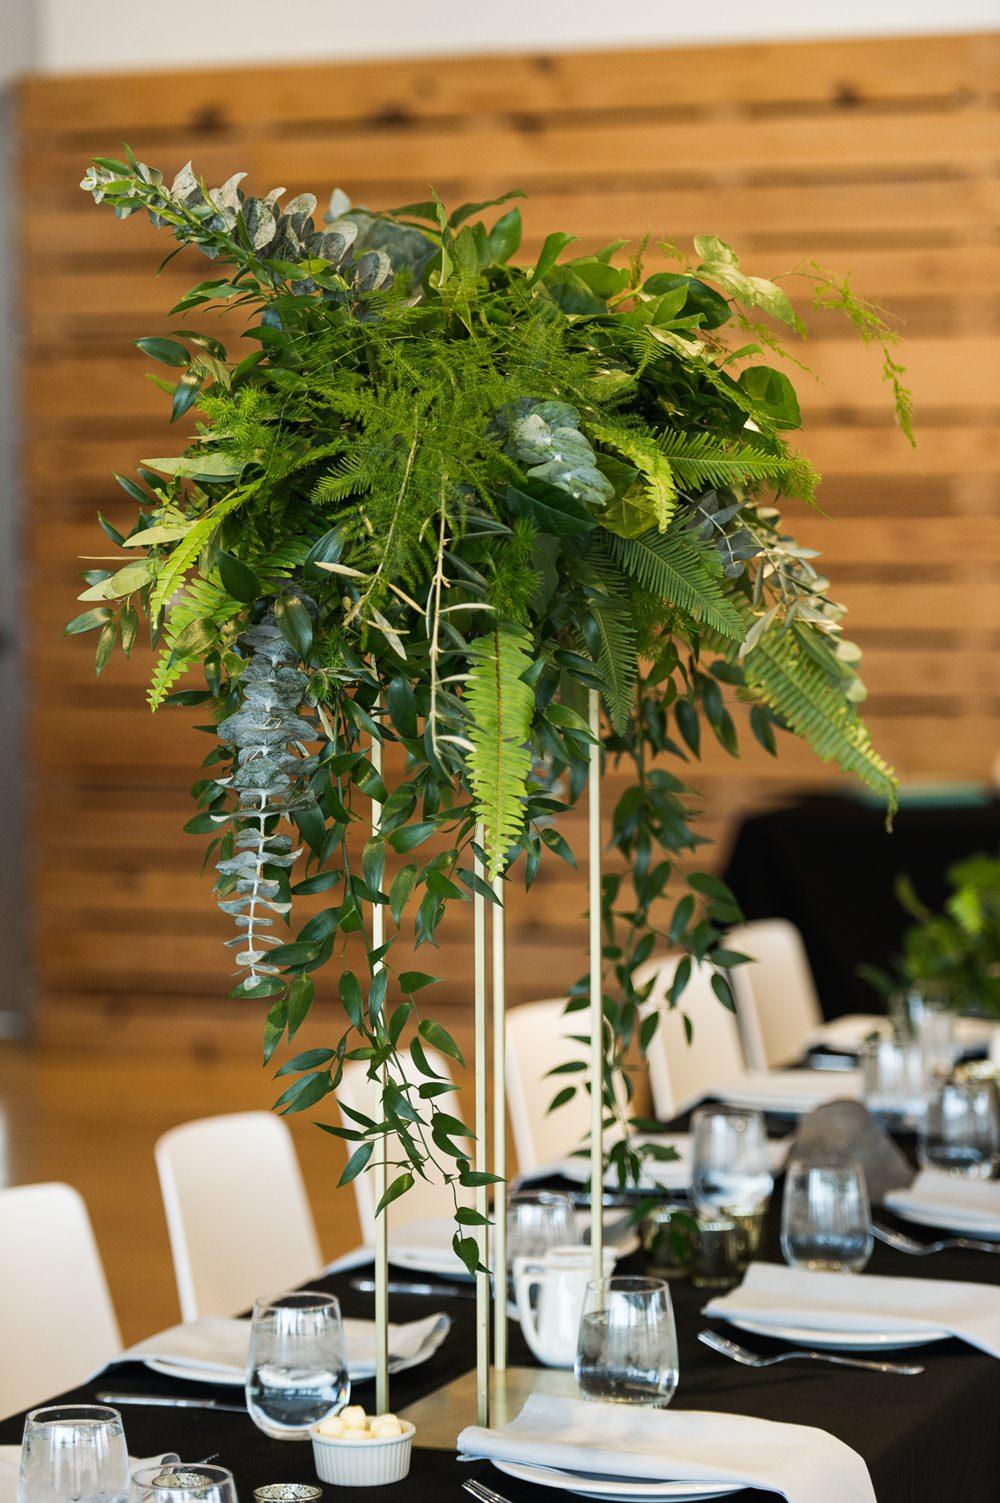 Centrepiece Table Decor Tall Greenery Foliage Fern Botanical Greenhouse Michigan Wedding Jean Smith Photography